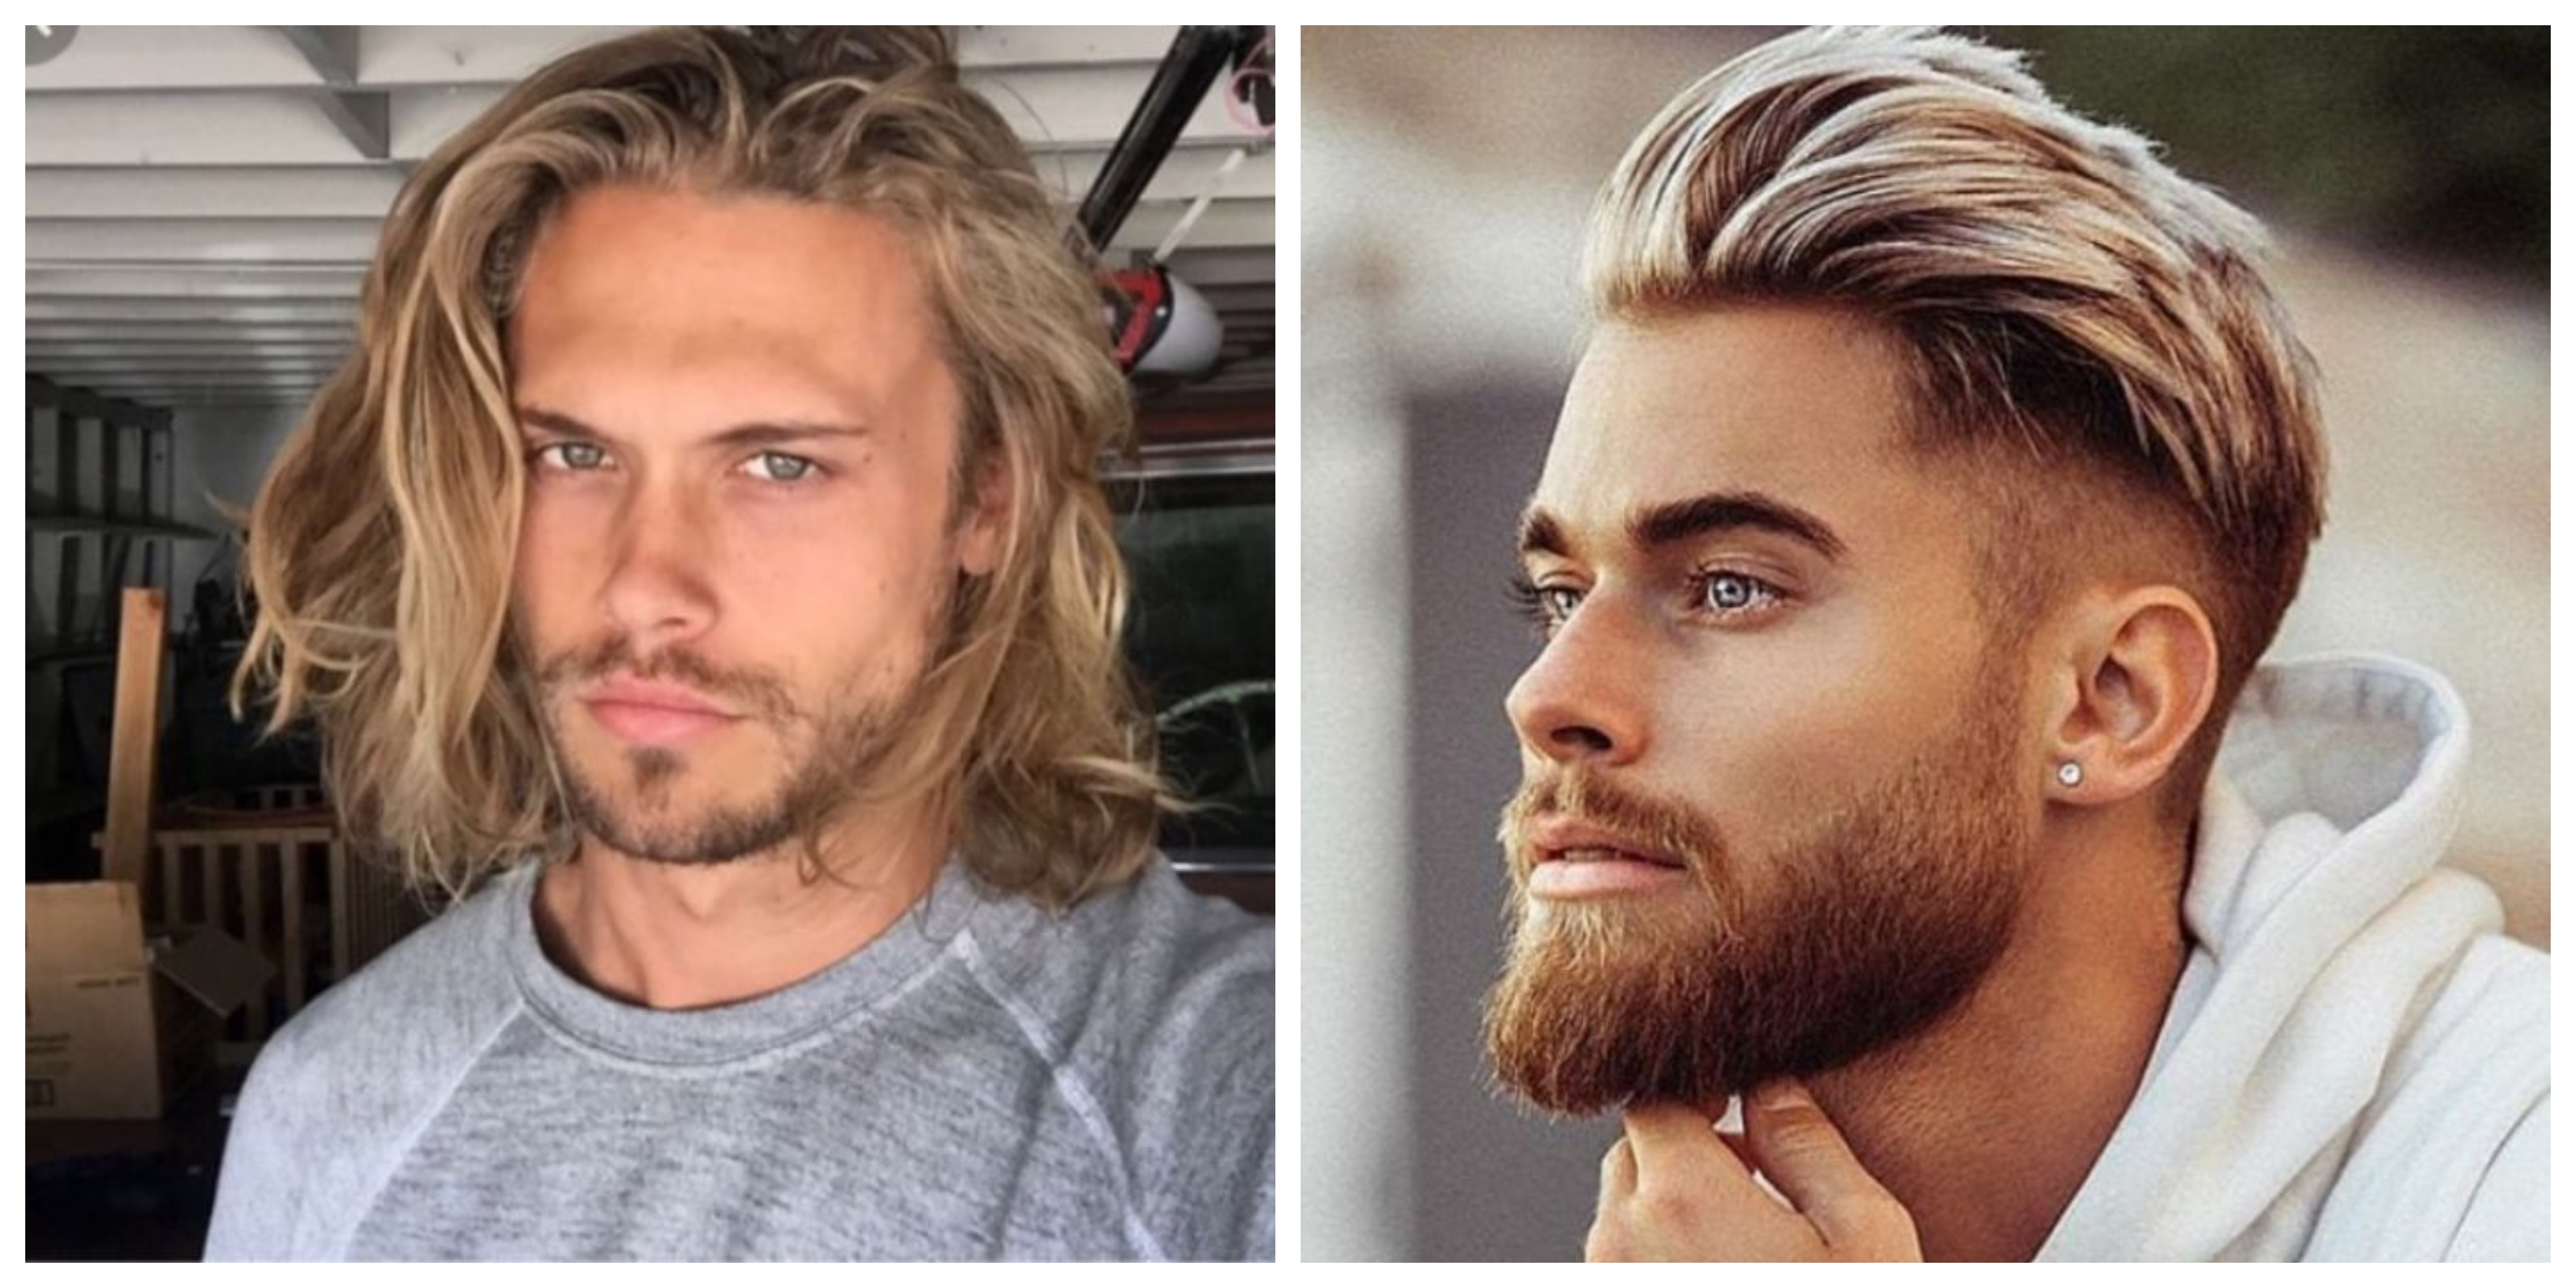 halblange haare, blonde haare mittellang bis mittelkurz, blonde männer styles